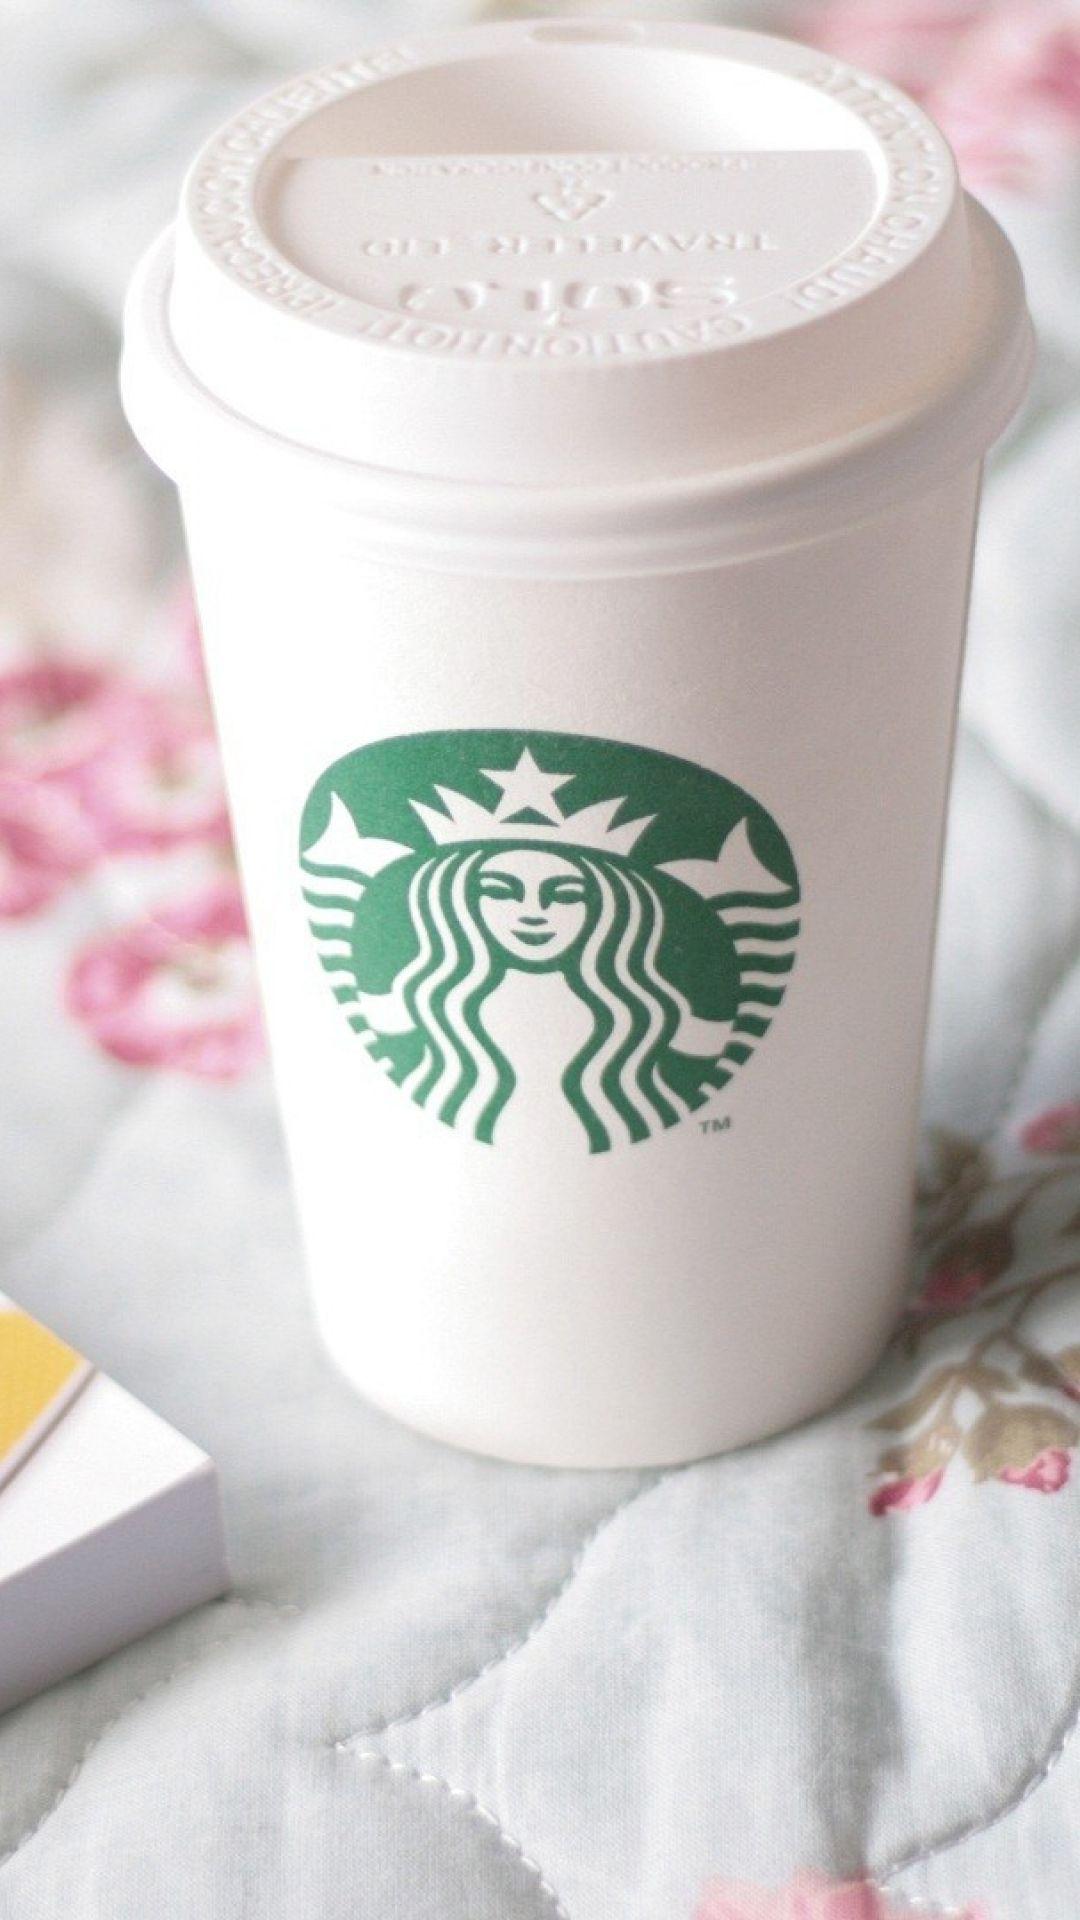 Starbucks Coffee Cup iPhone 6 Plus HD Wallpaper